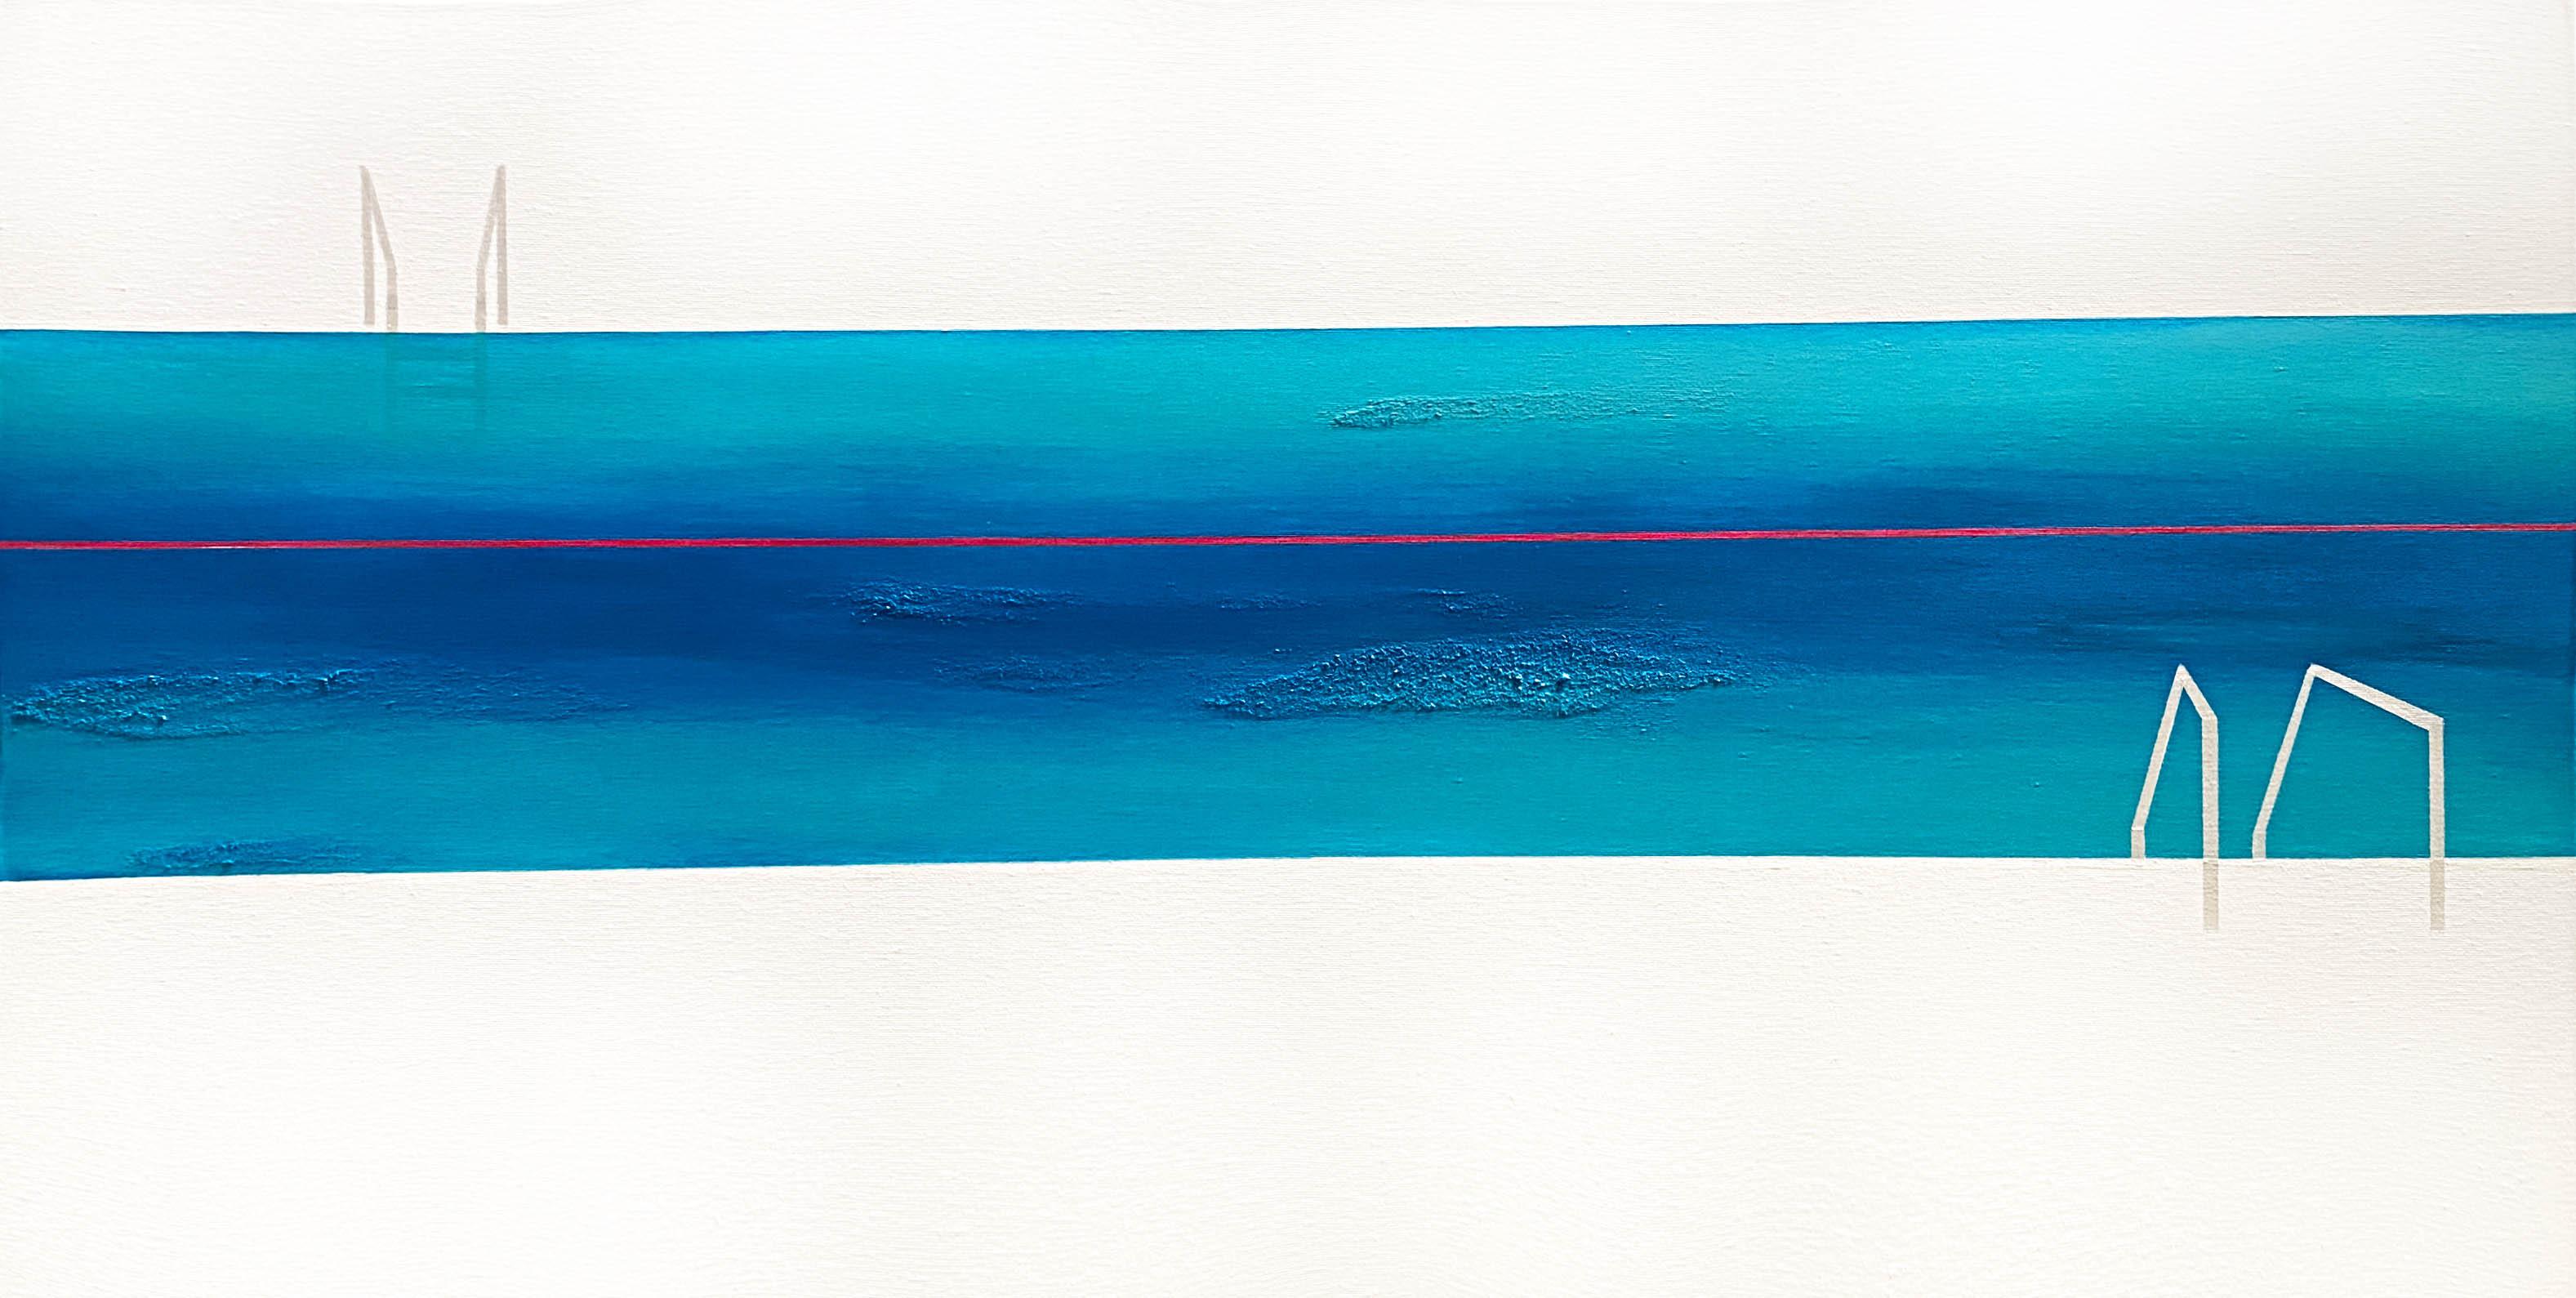 Swimming pool 1 (2020)